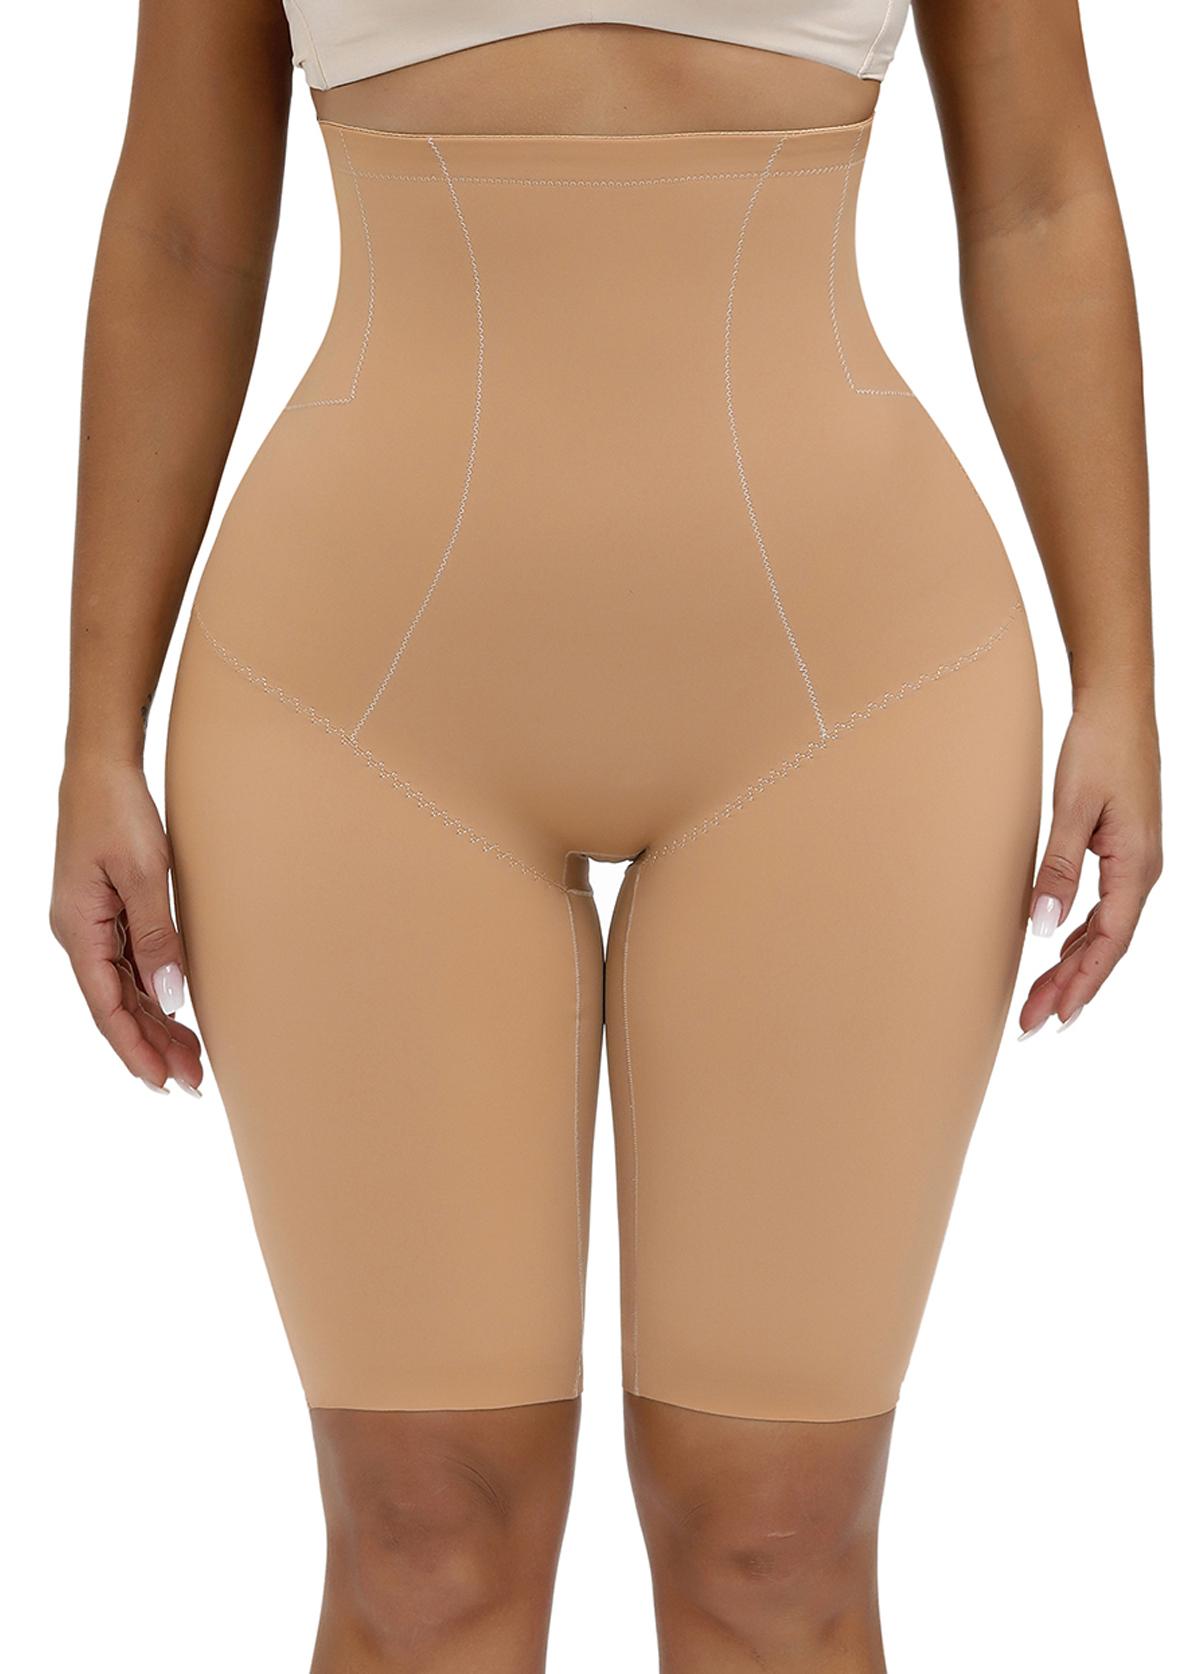 Beige High Waisted Panties for Women